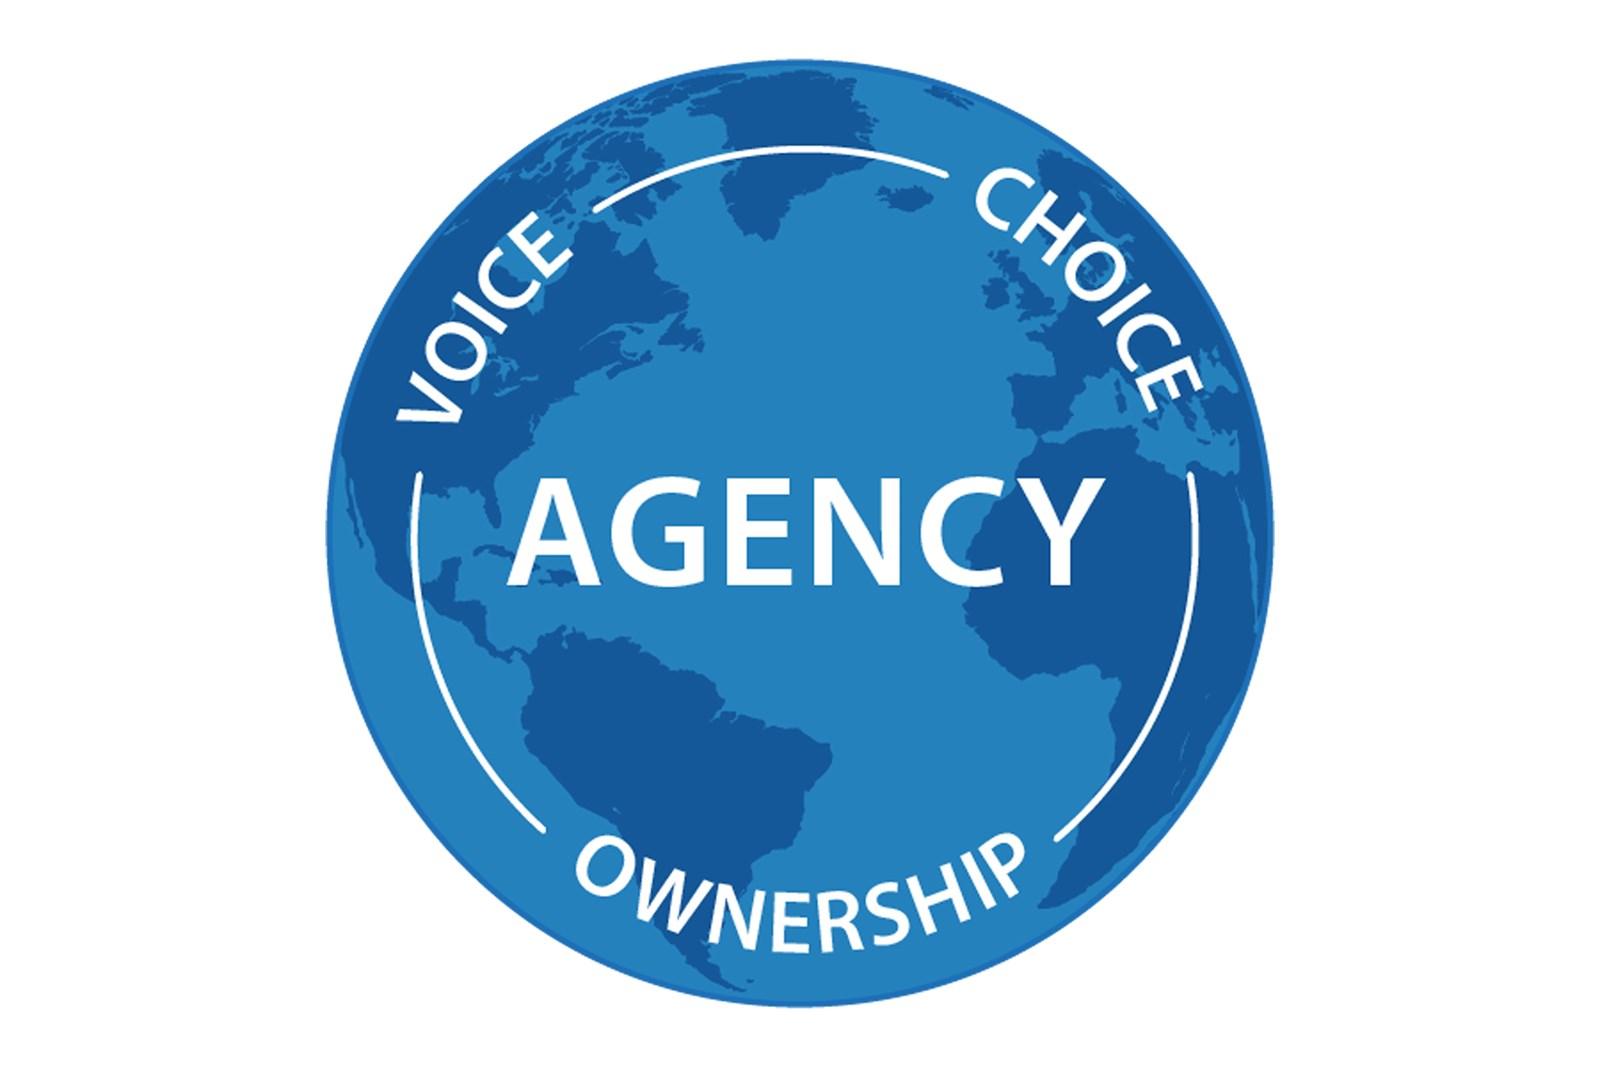 Learner Agency 4X6.jpg